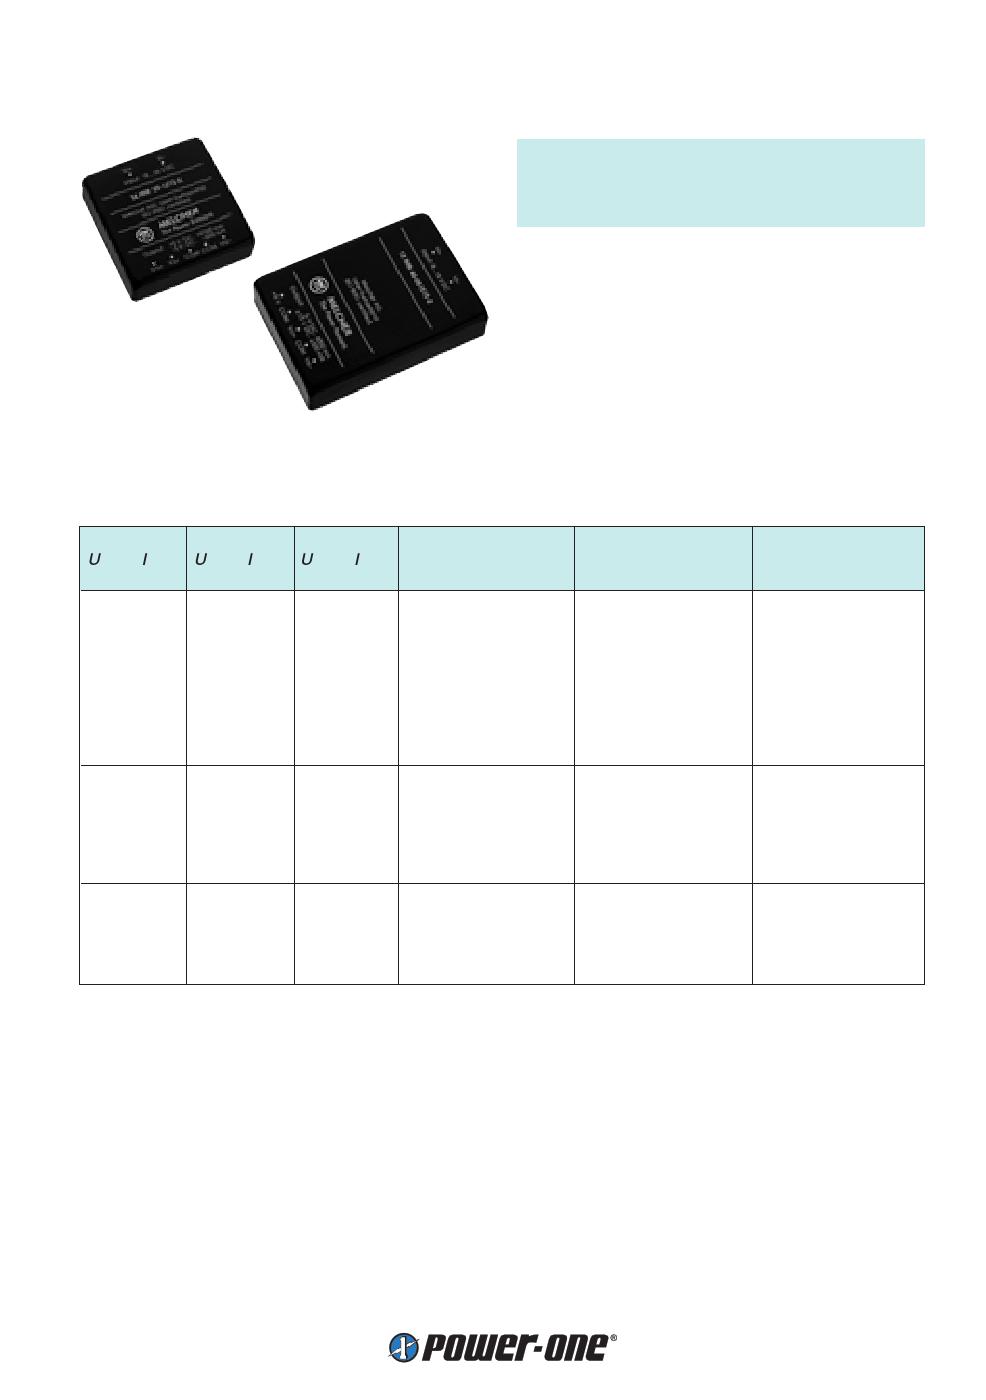 24IMR25-05-2 datasheet